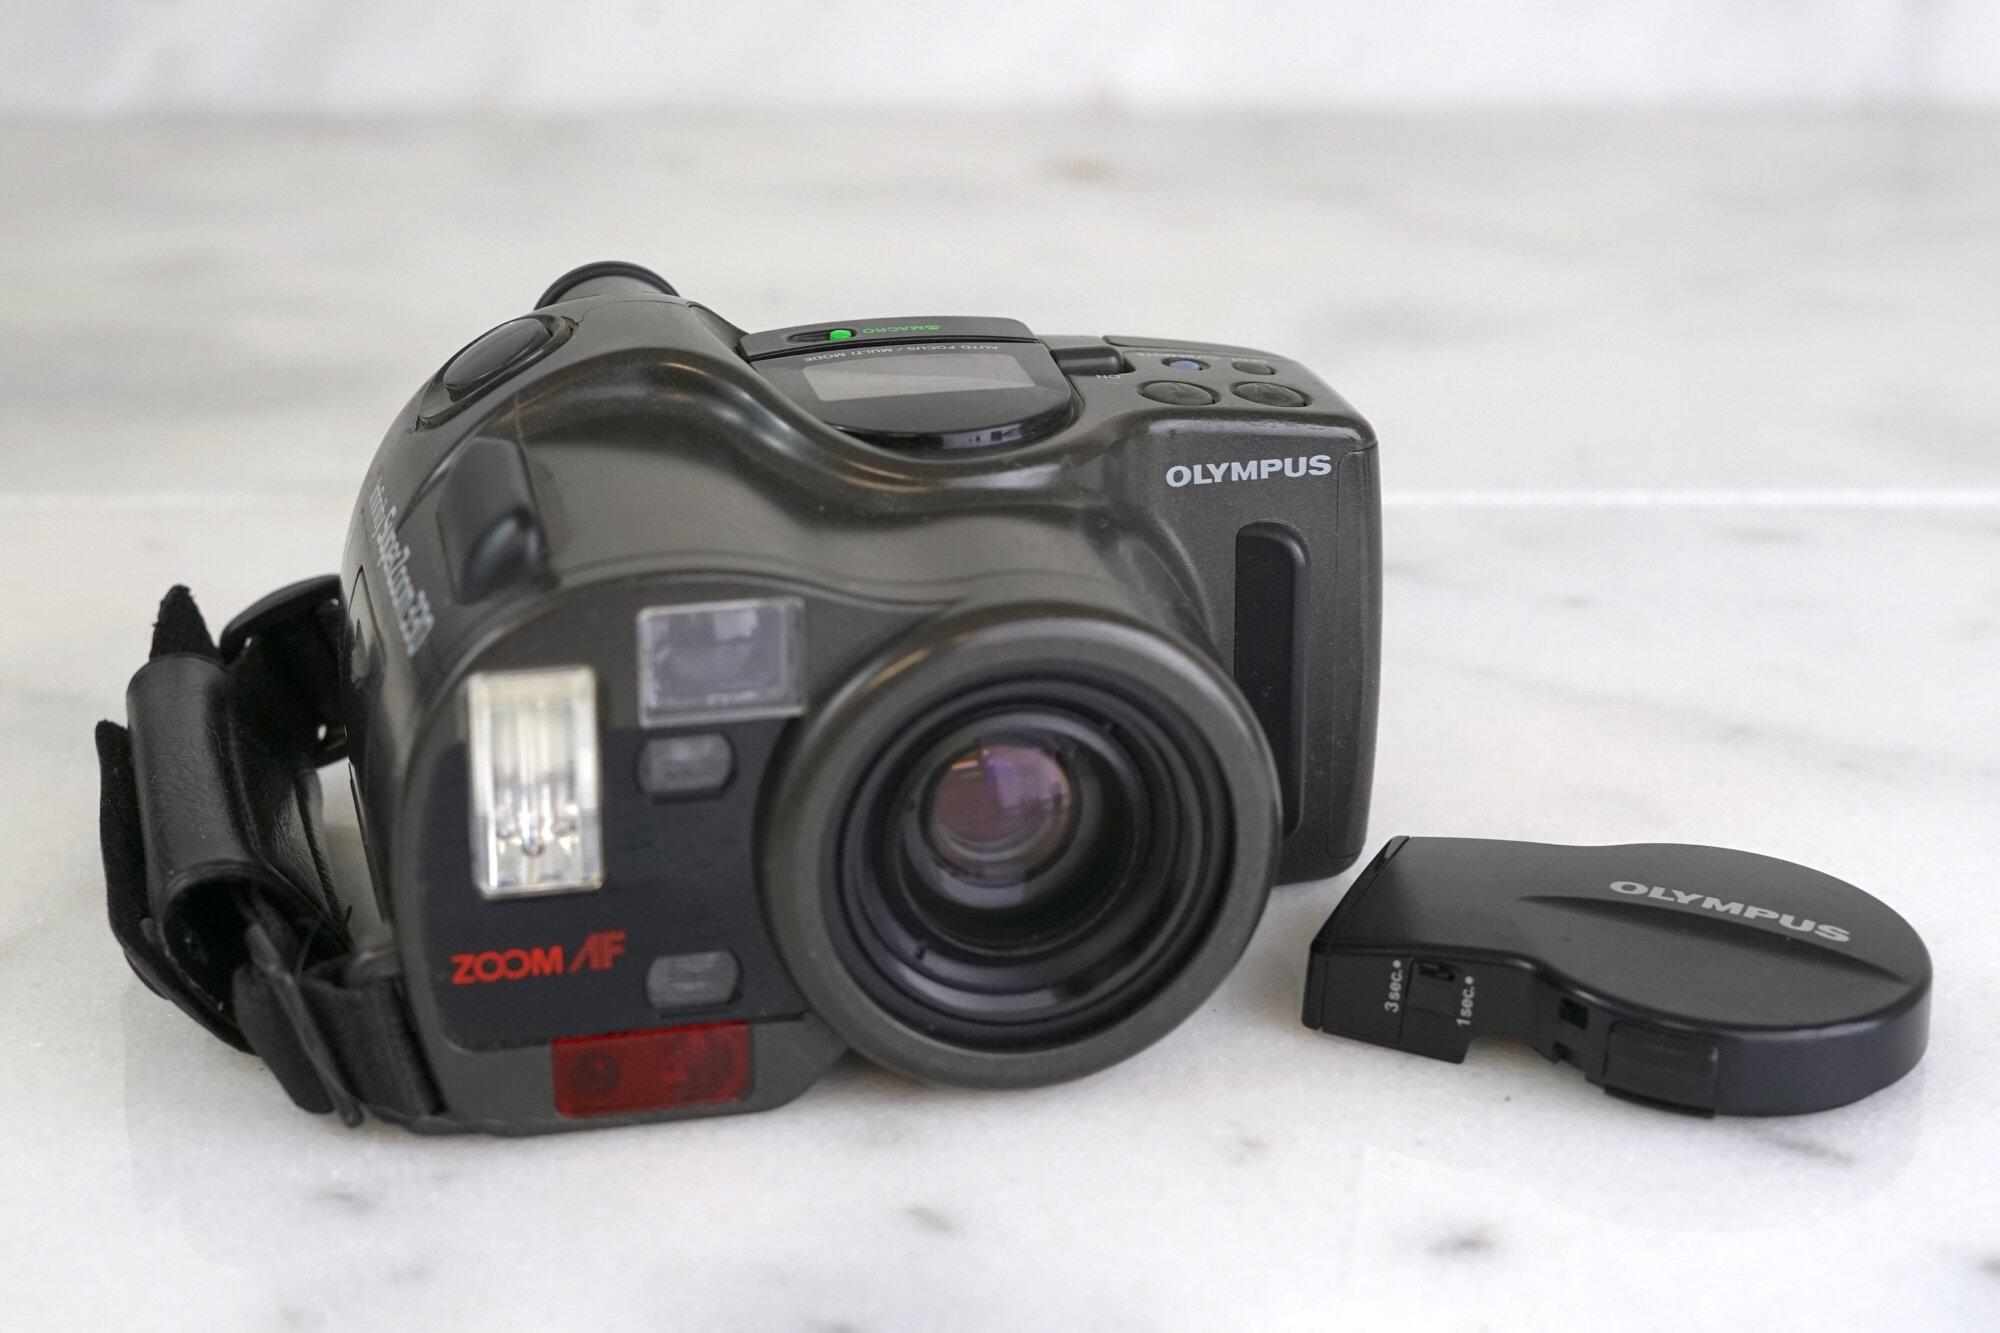 Olympus Infinity Super Zoom 3000 Multi Af 35mm Camera